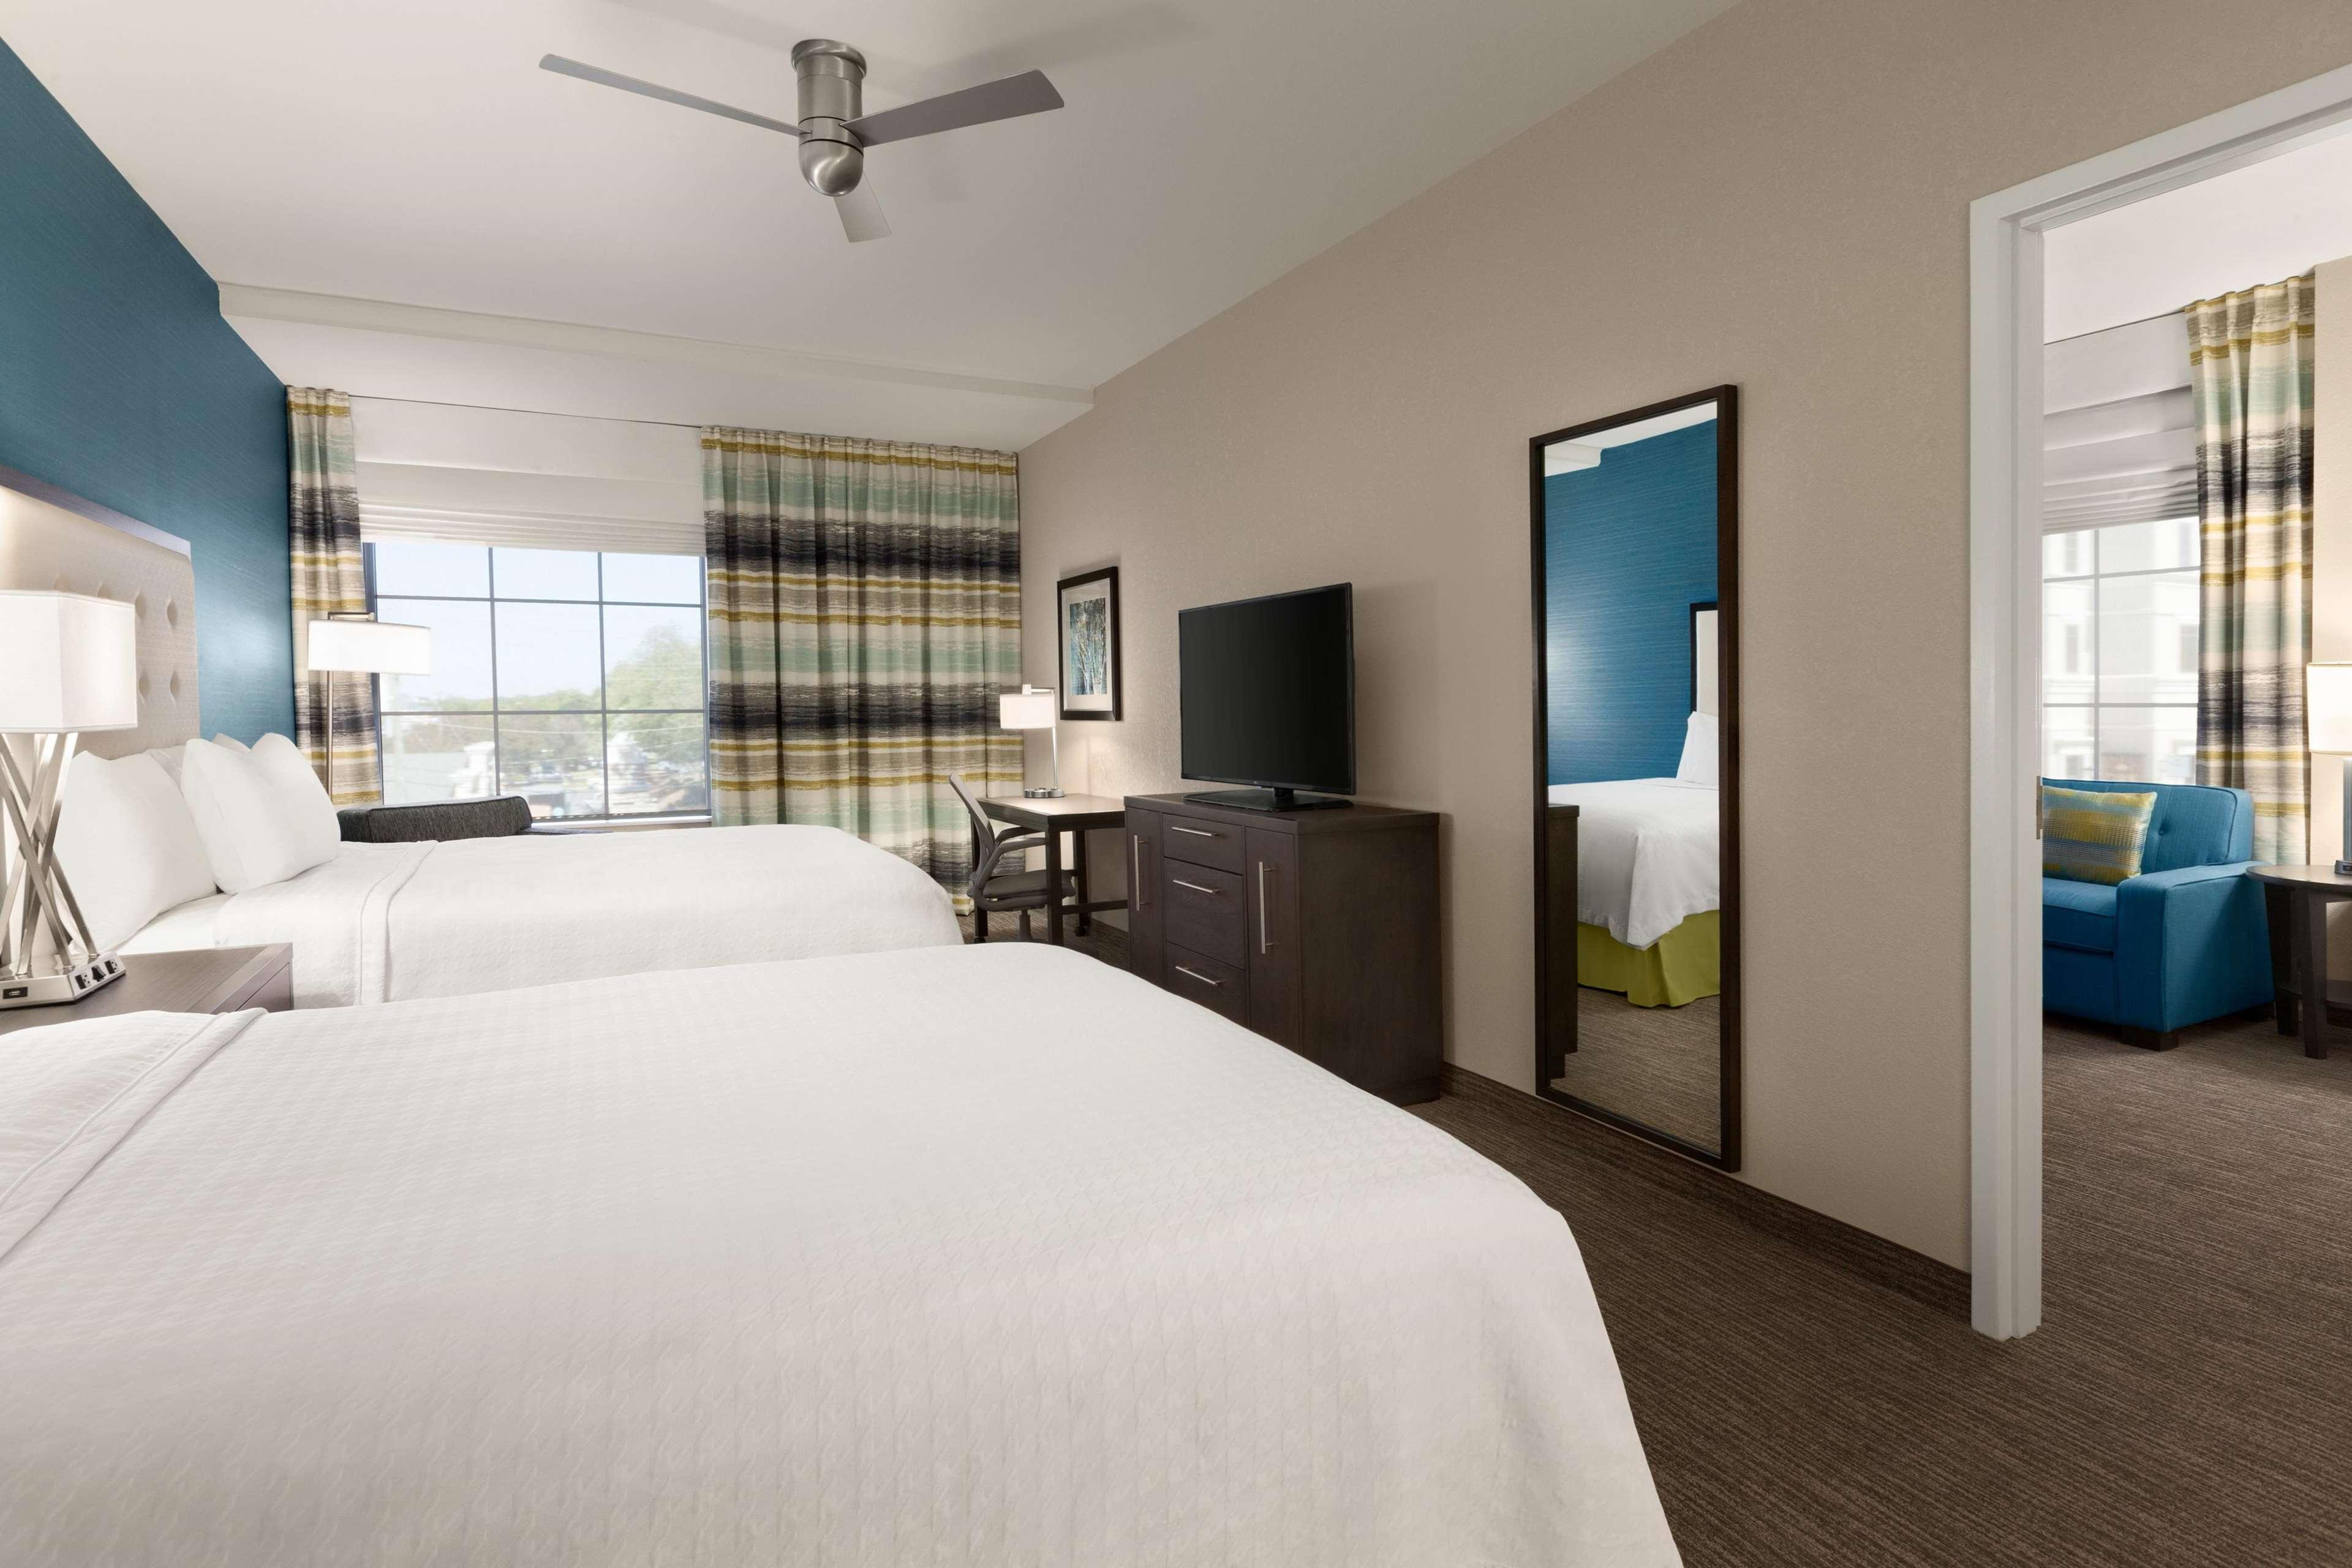 Homewood Suites By Hilton Charlotte Southpark Charlotte North Carolina Nc